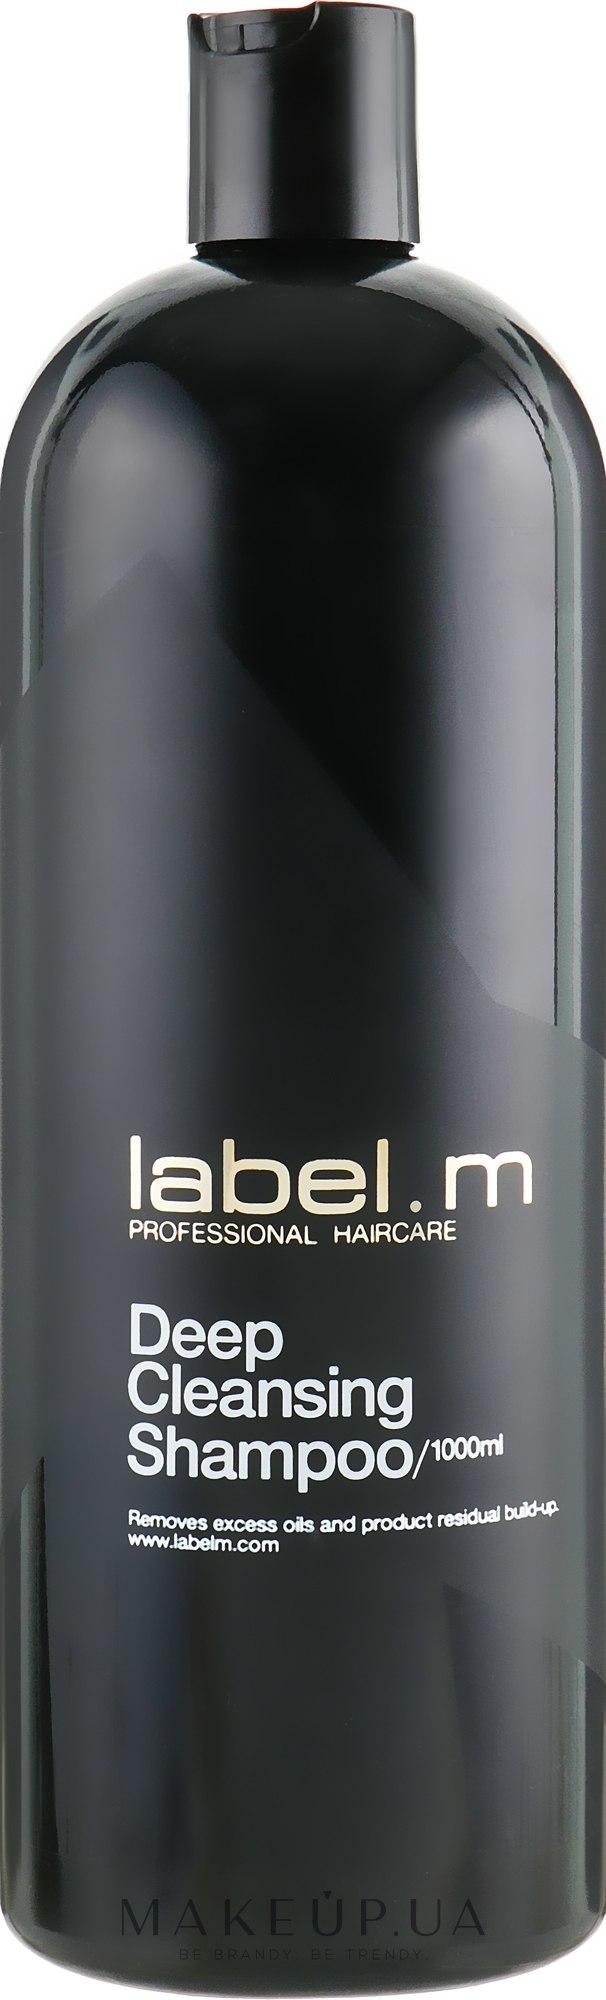 Шампунь Глубокая очистка - Label.m Cleanse Professional Haircare Deep Cleansing Shampoo — фото 1000ml